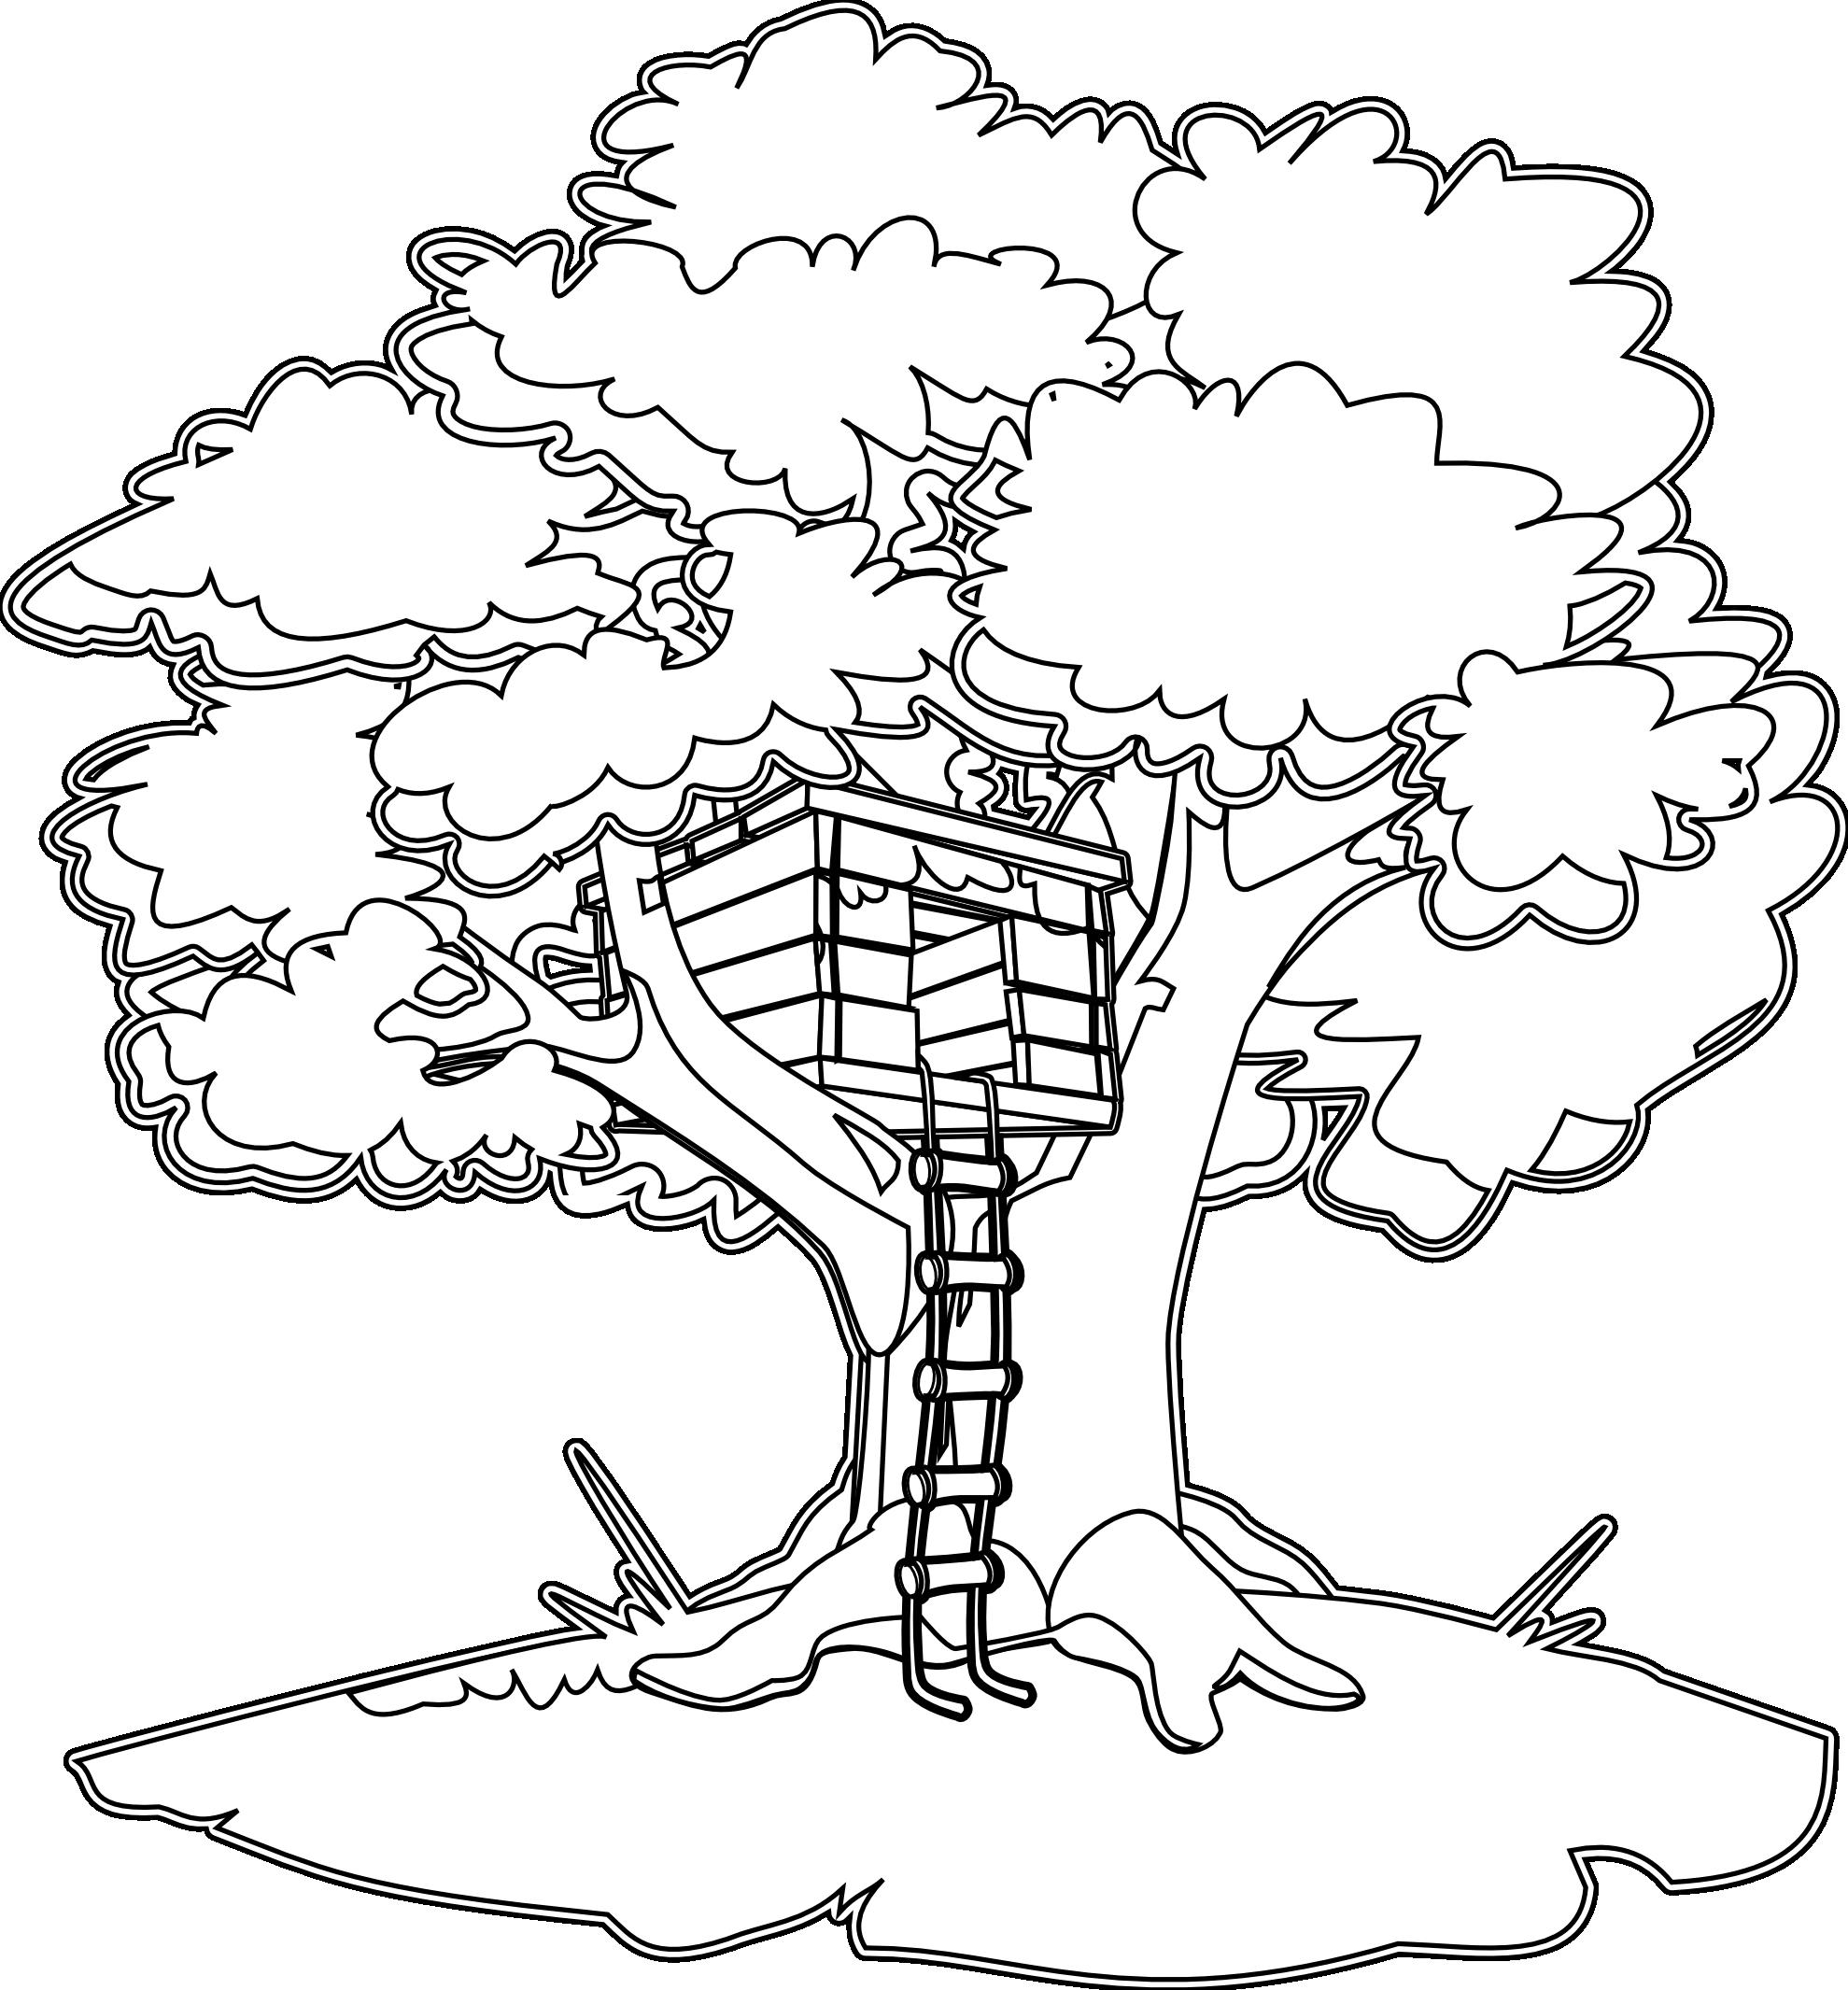 Magic Tree House Coloring Pages   Duam